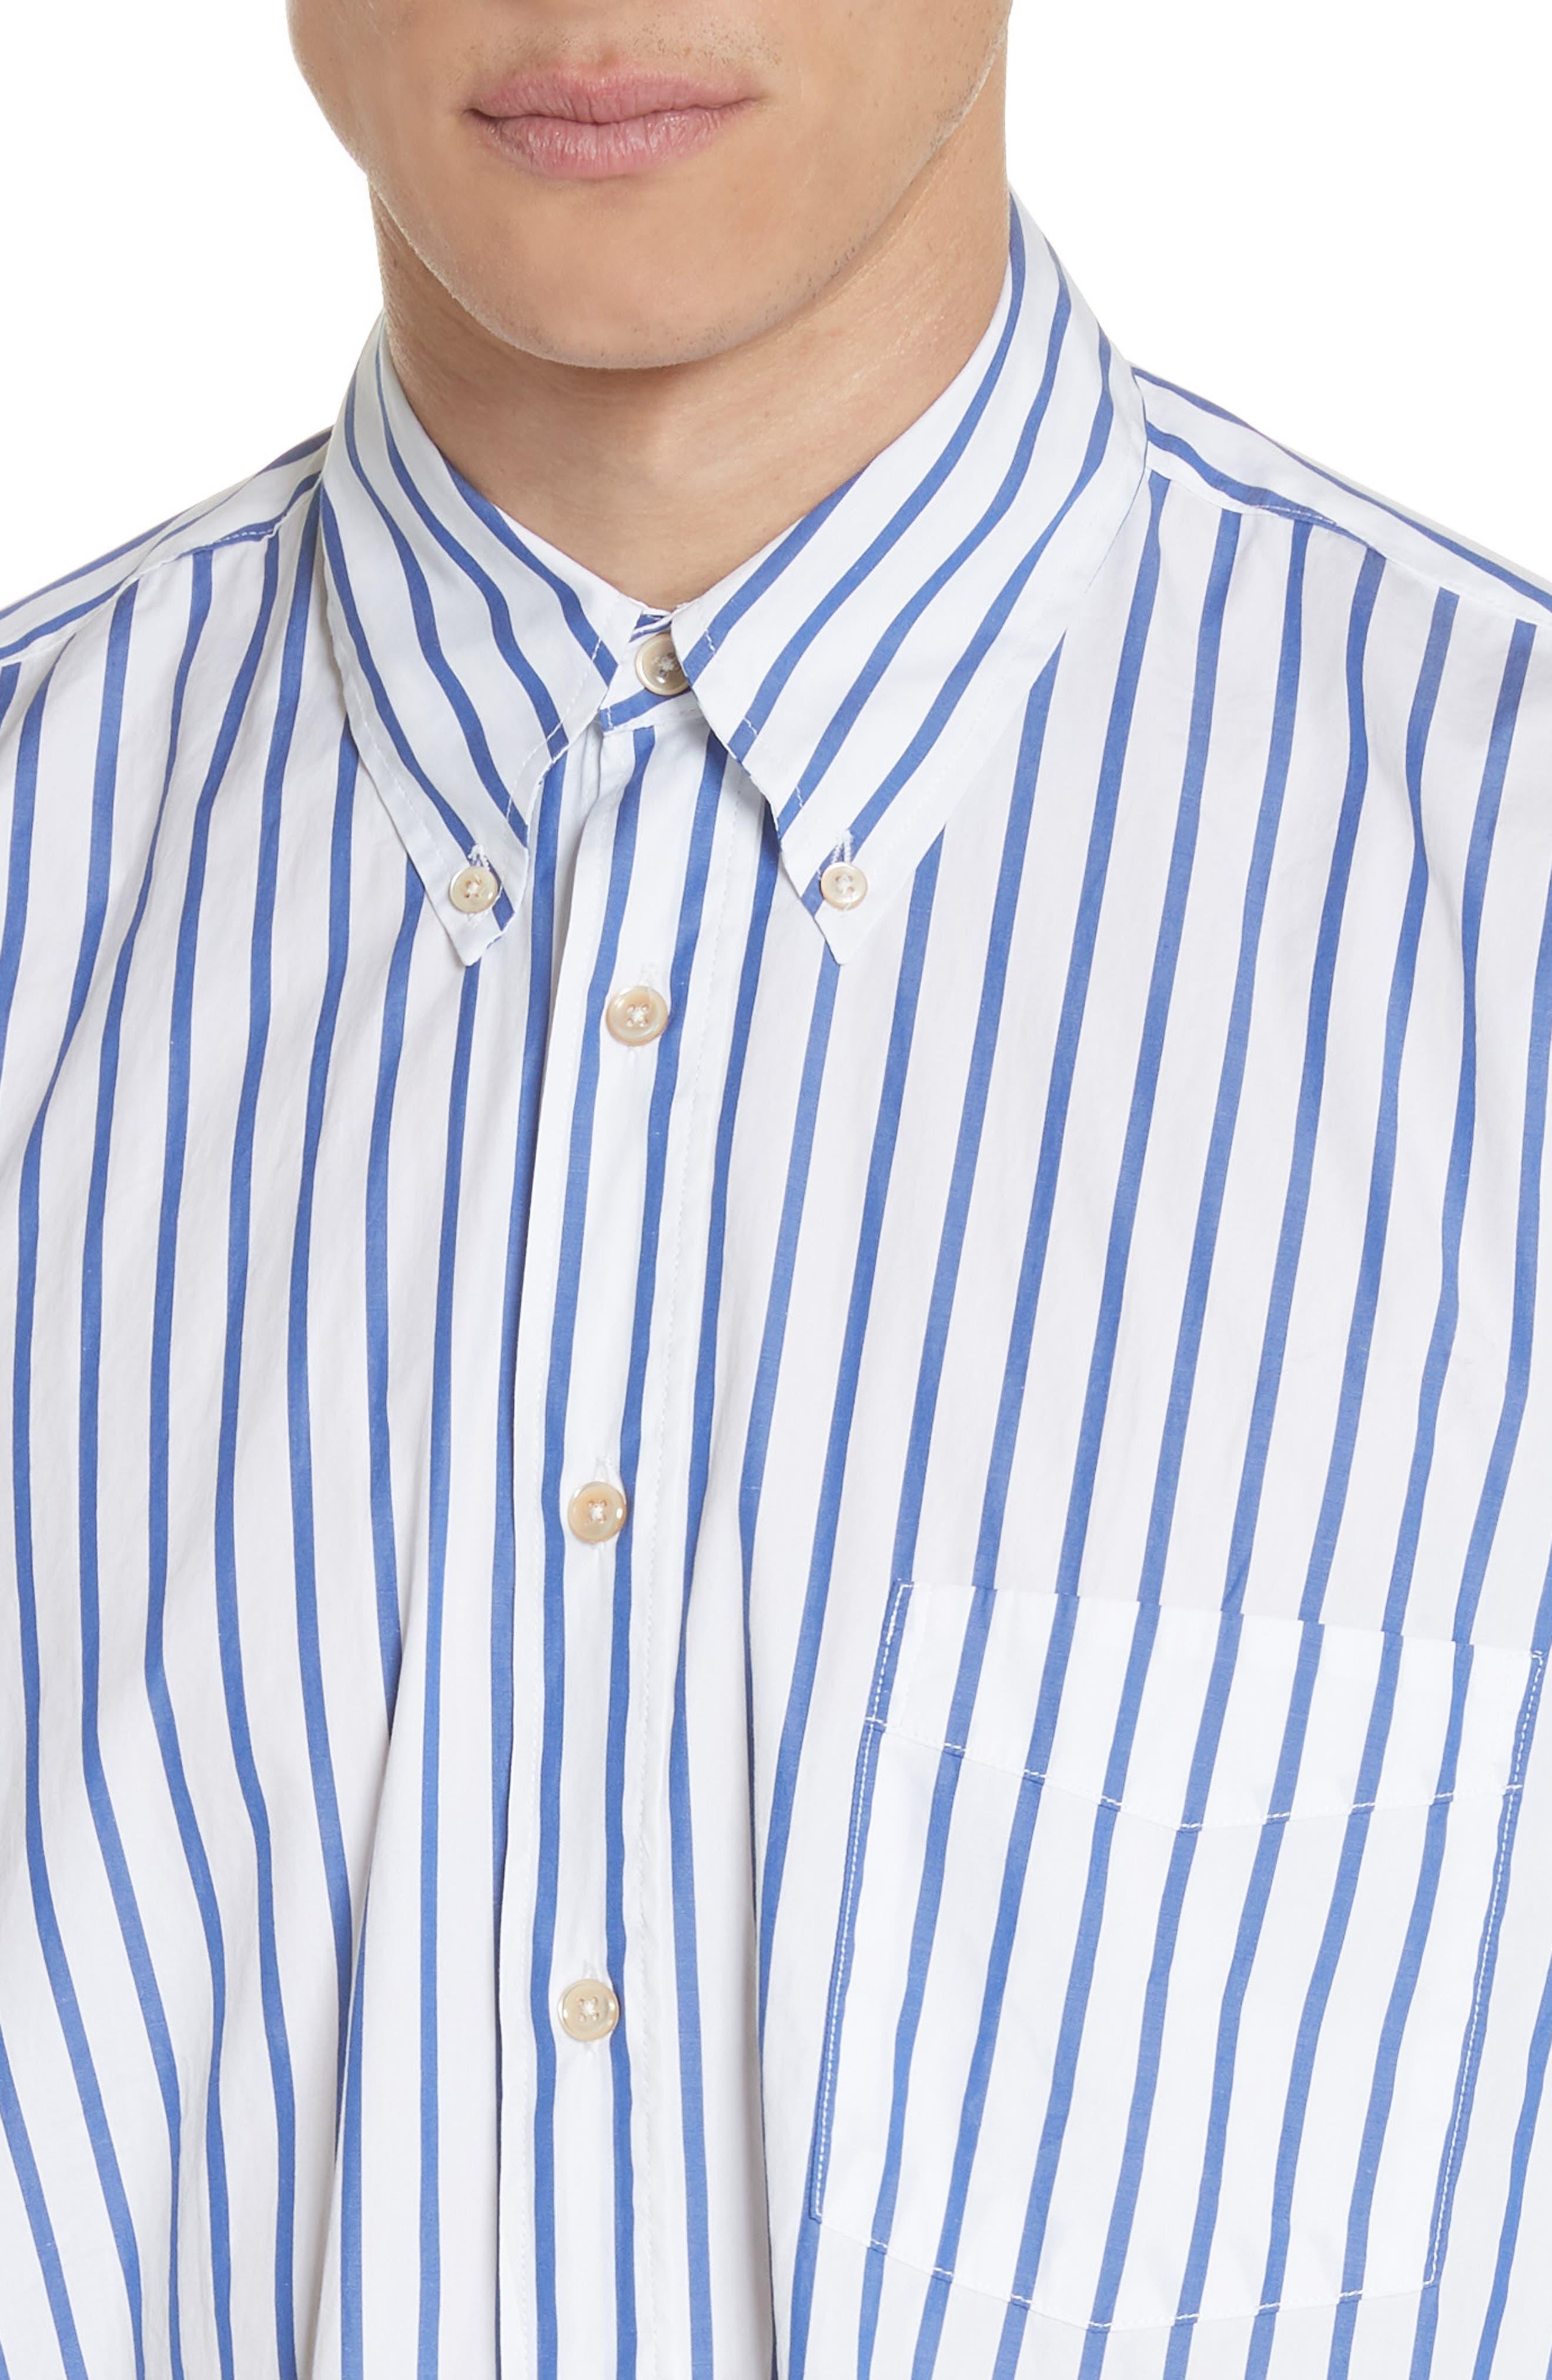 Oversize Stripe Woven Shirt,                             Alternate thumbnail 4, color,                             400